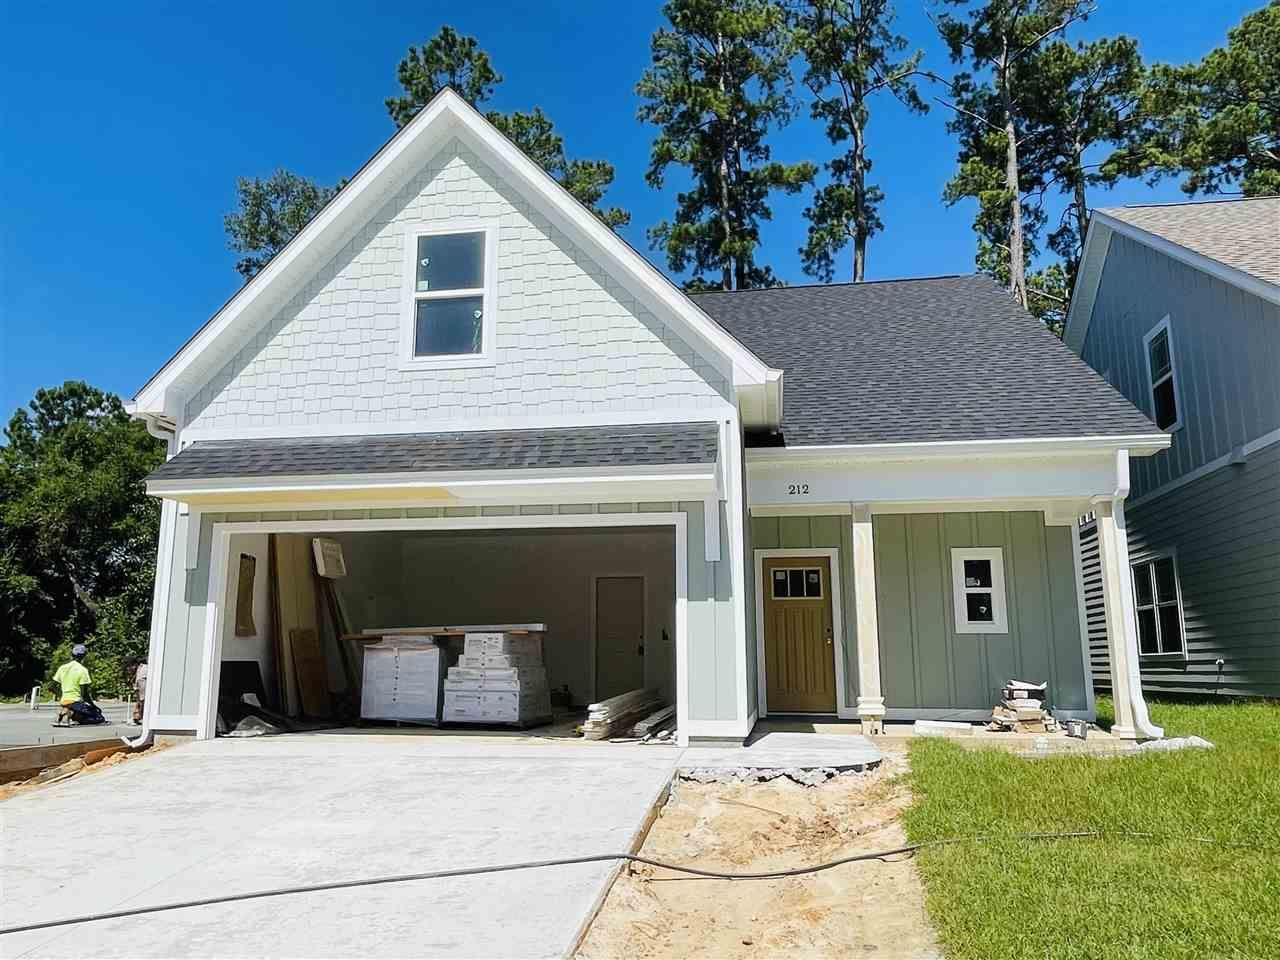 212 Cottage Court, Tallahassee, FL 32308 - MLS#: 328173